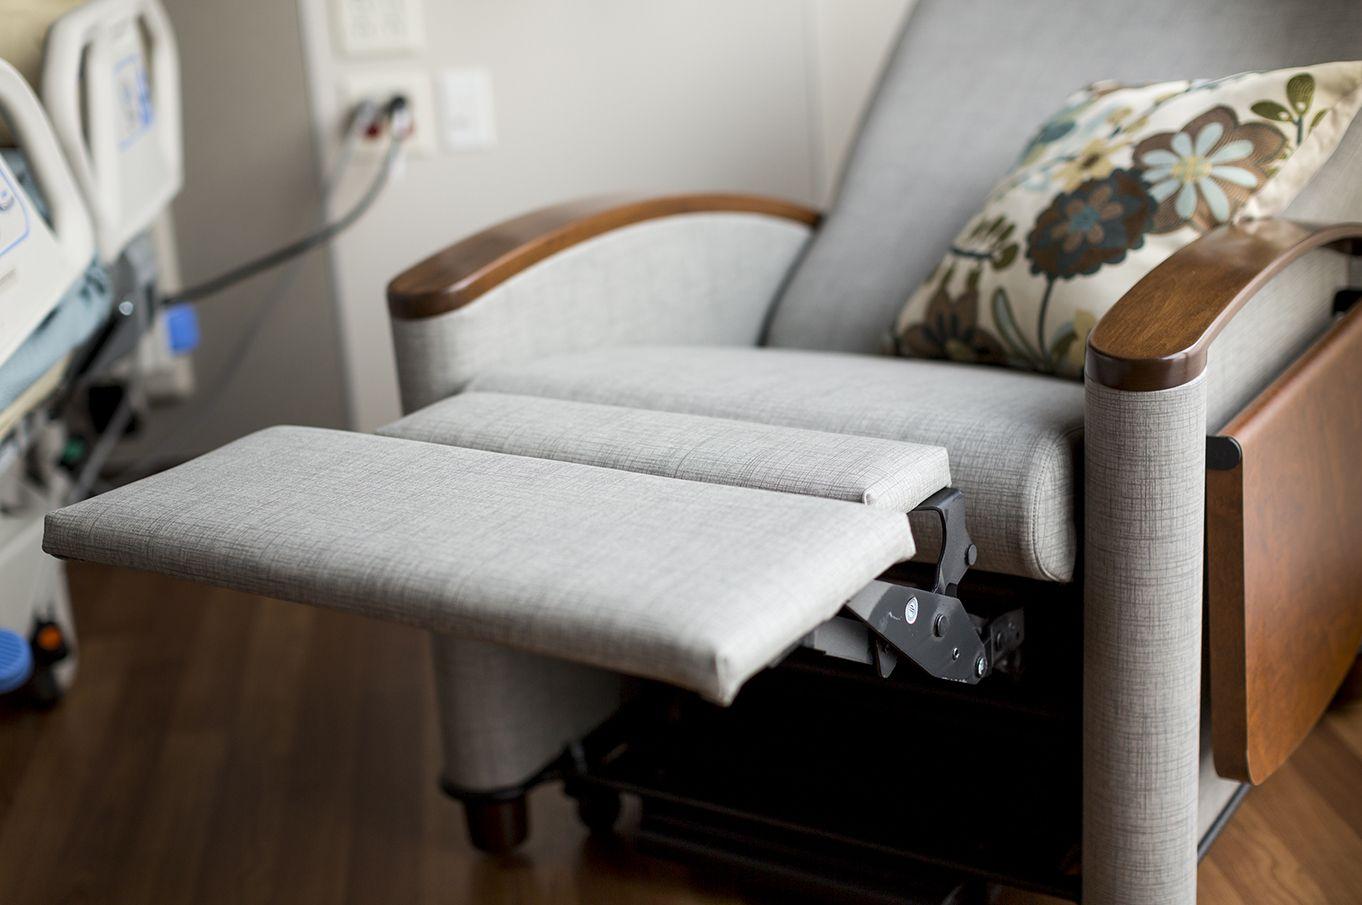 cove patient recliner Healthcare furniture, Furniture